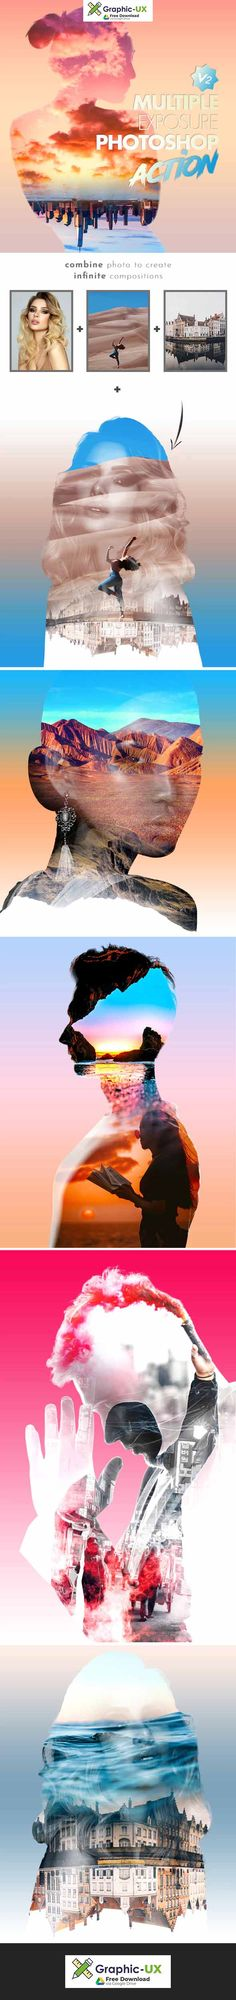 Multiple Exposure V2 Photoshop Action free download – GraphicUX Free Photoshop, Photoshop Actions, Multiple Exposure, Lightroom Presets, Wordpress Theme, Wordpress Template